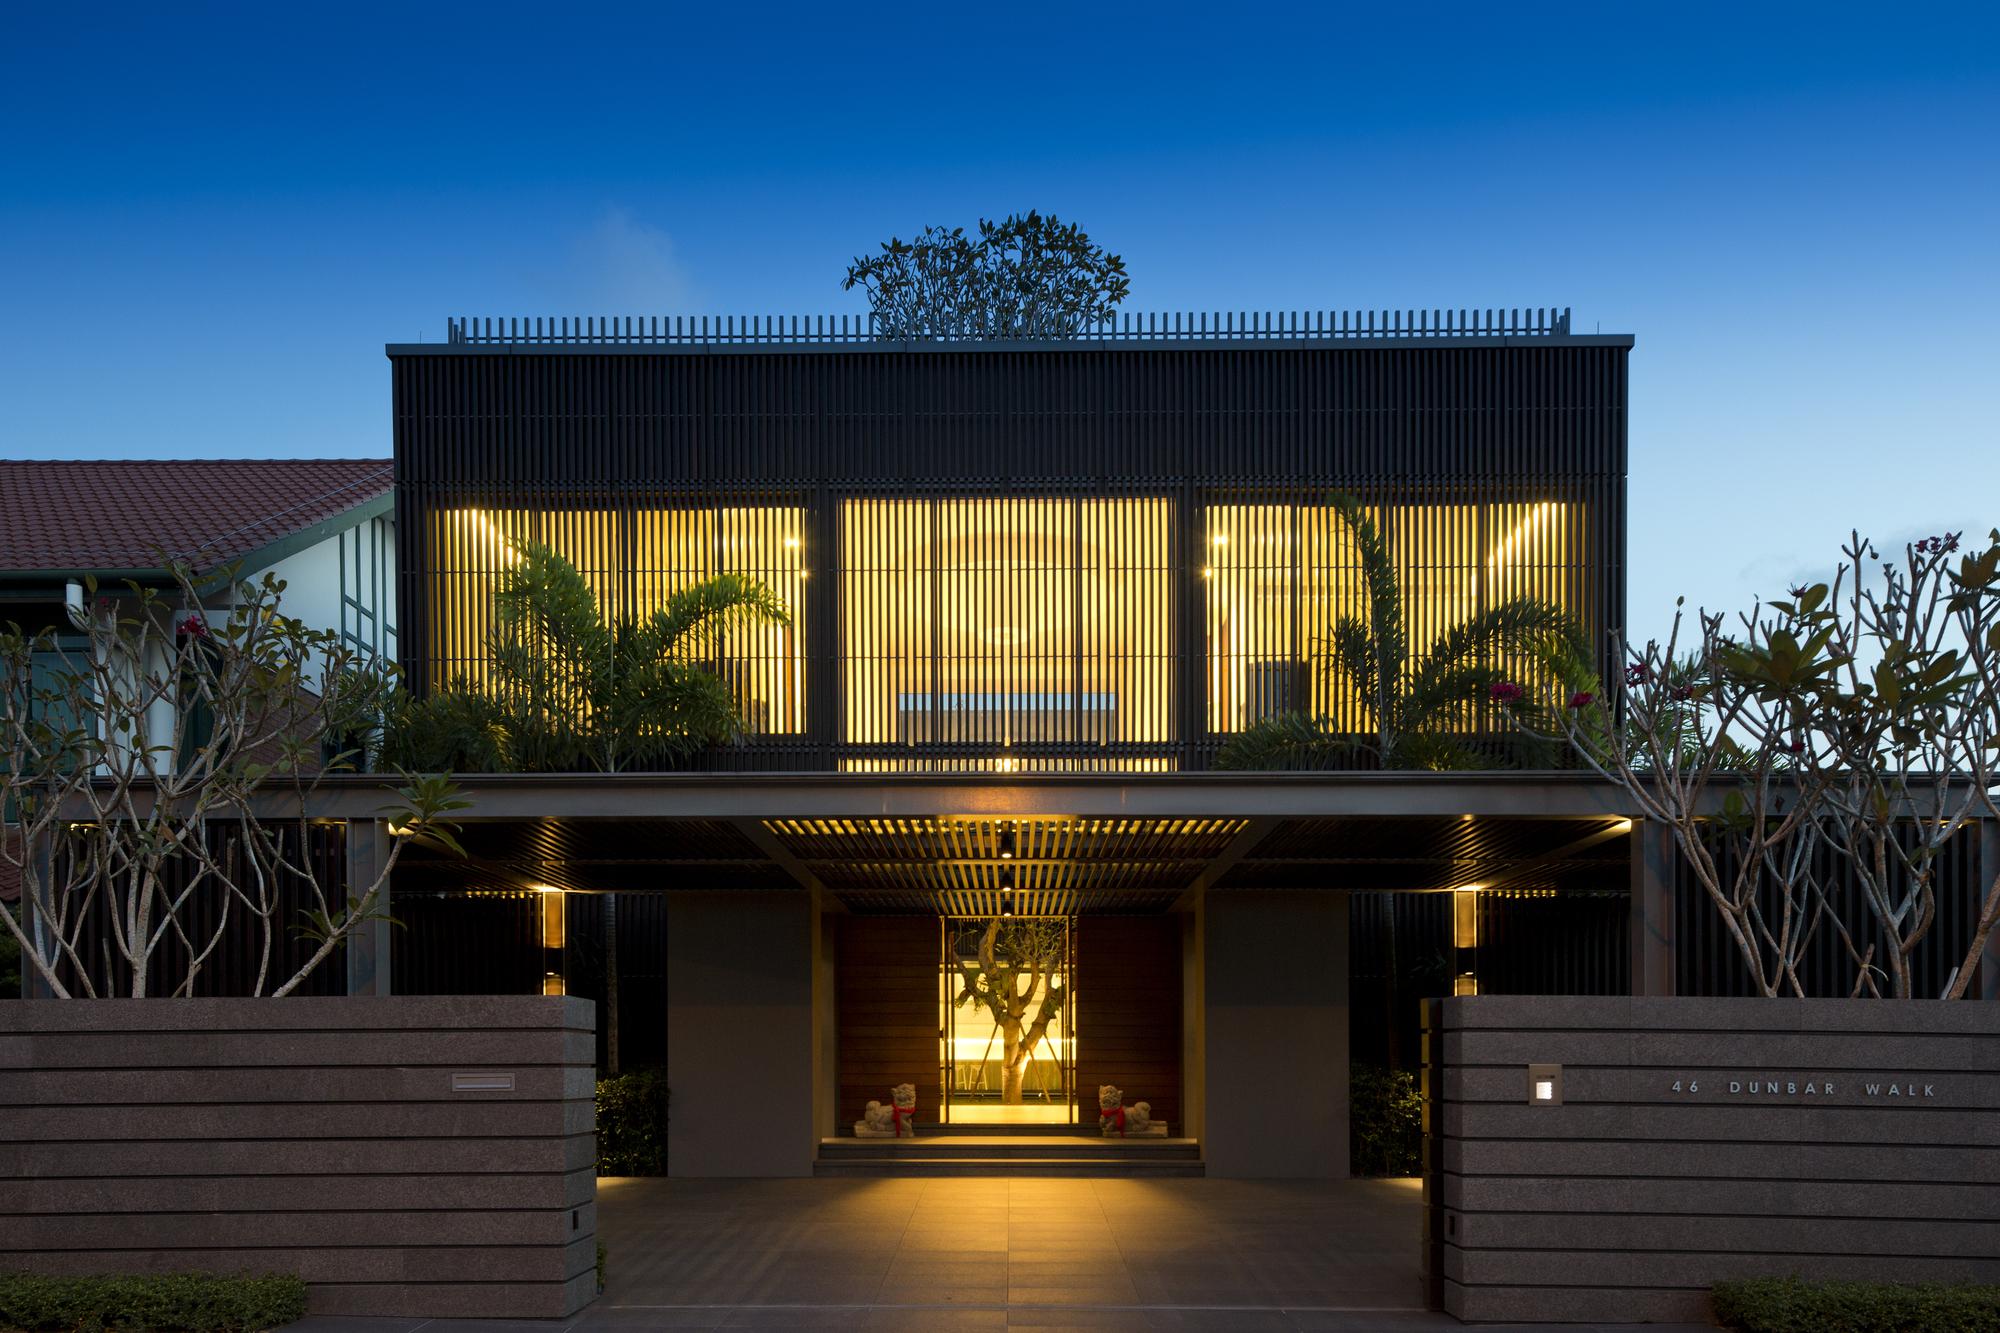 Arquitectura moderna para el rbol centenario for Casas de container modernas